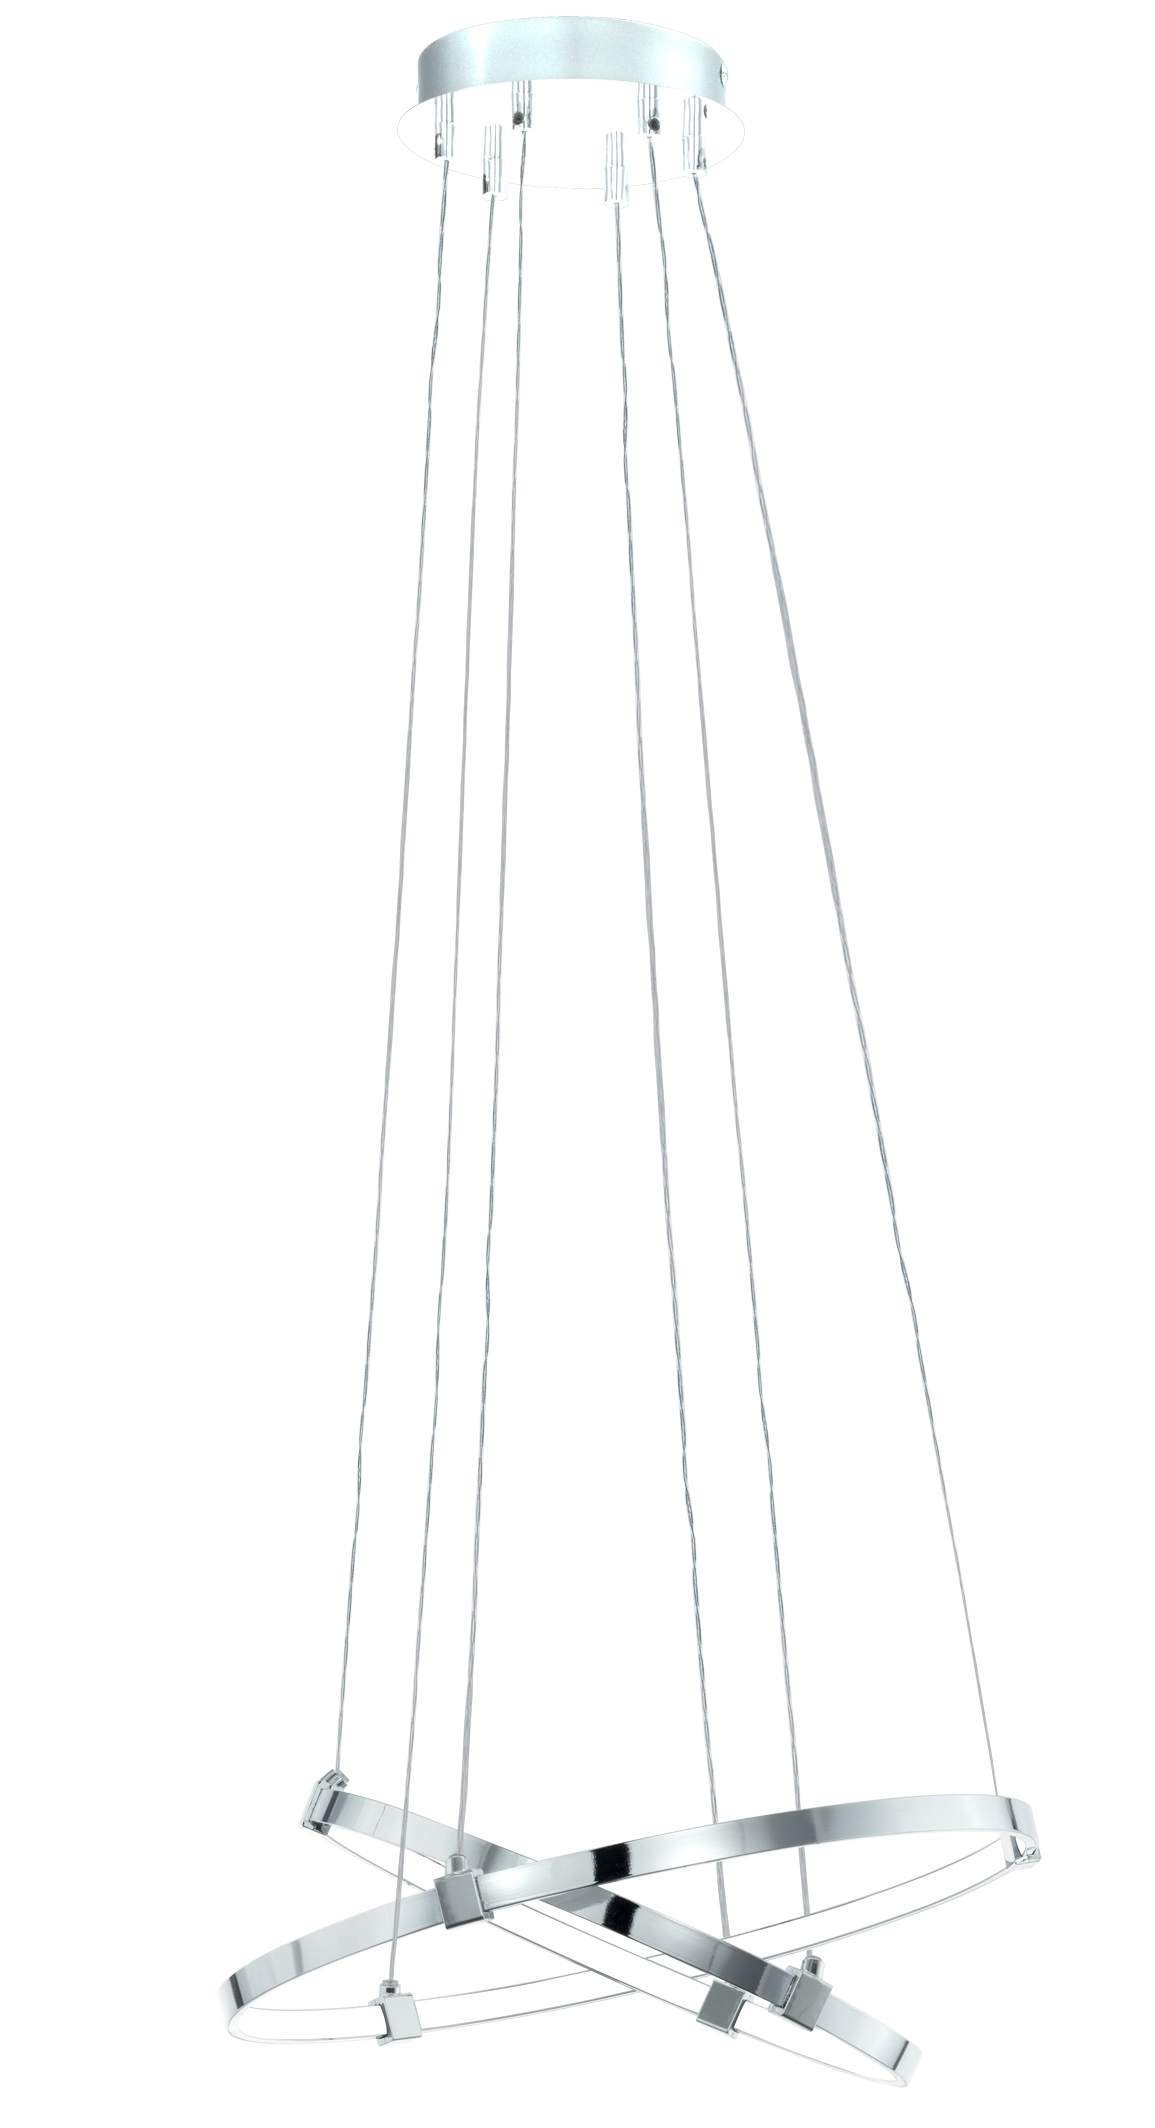 Suspensie Eglo Nebreda 1x6.7W + 1x8.7W LED d 45cm h 120cm crom